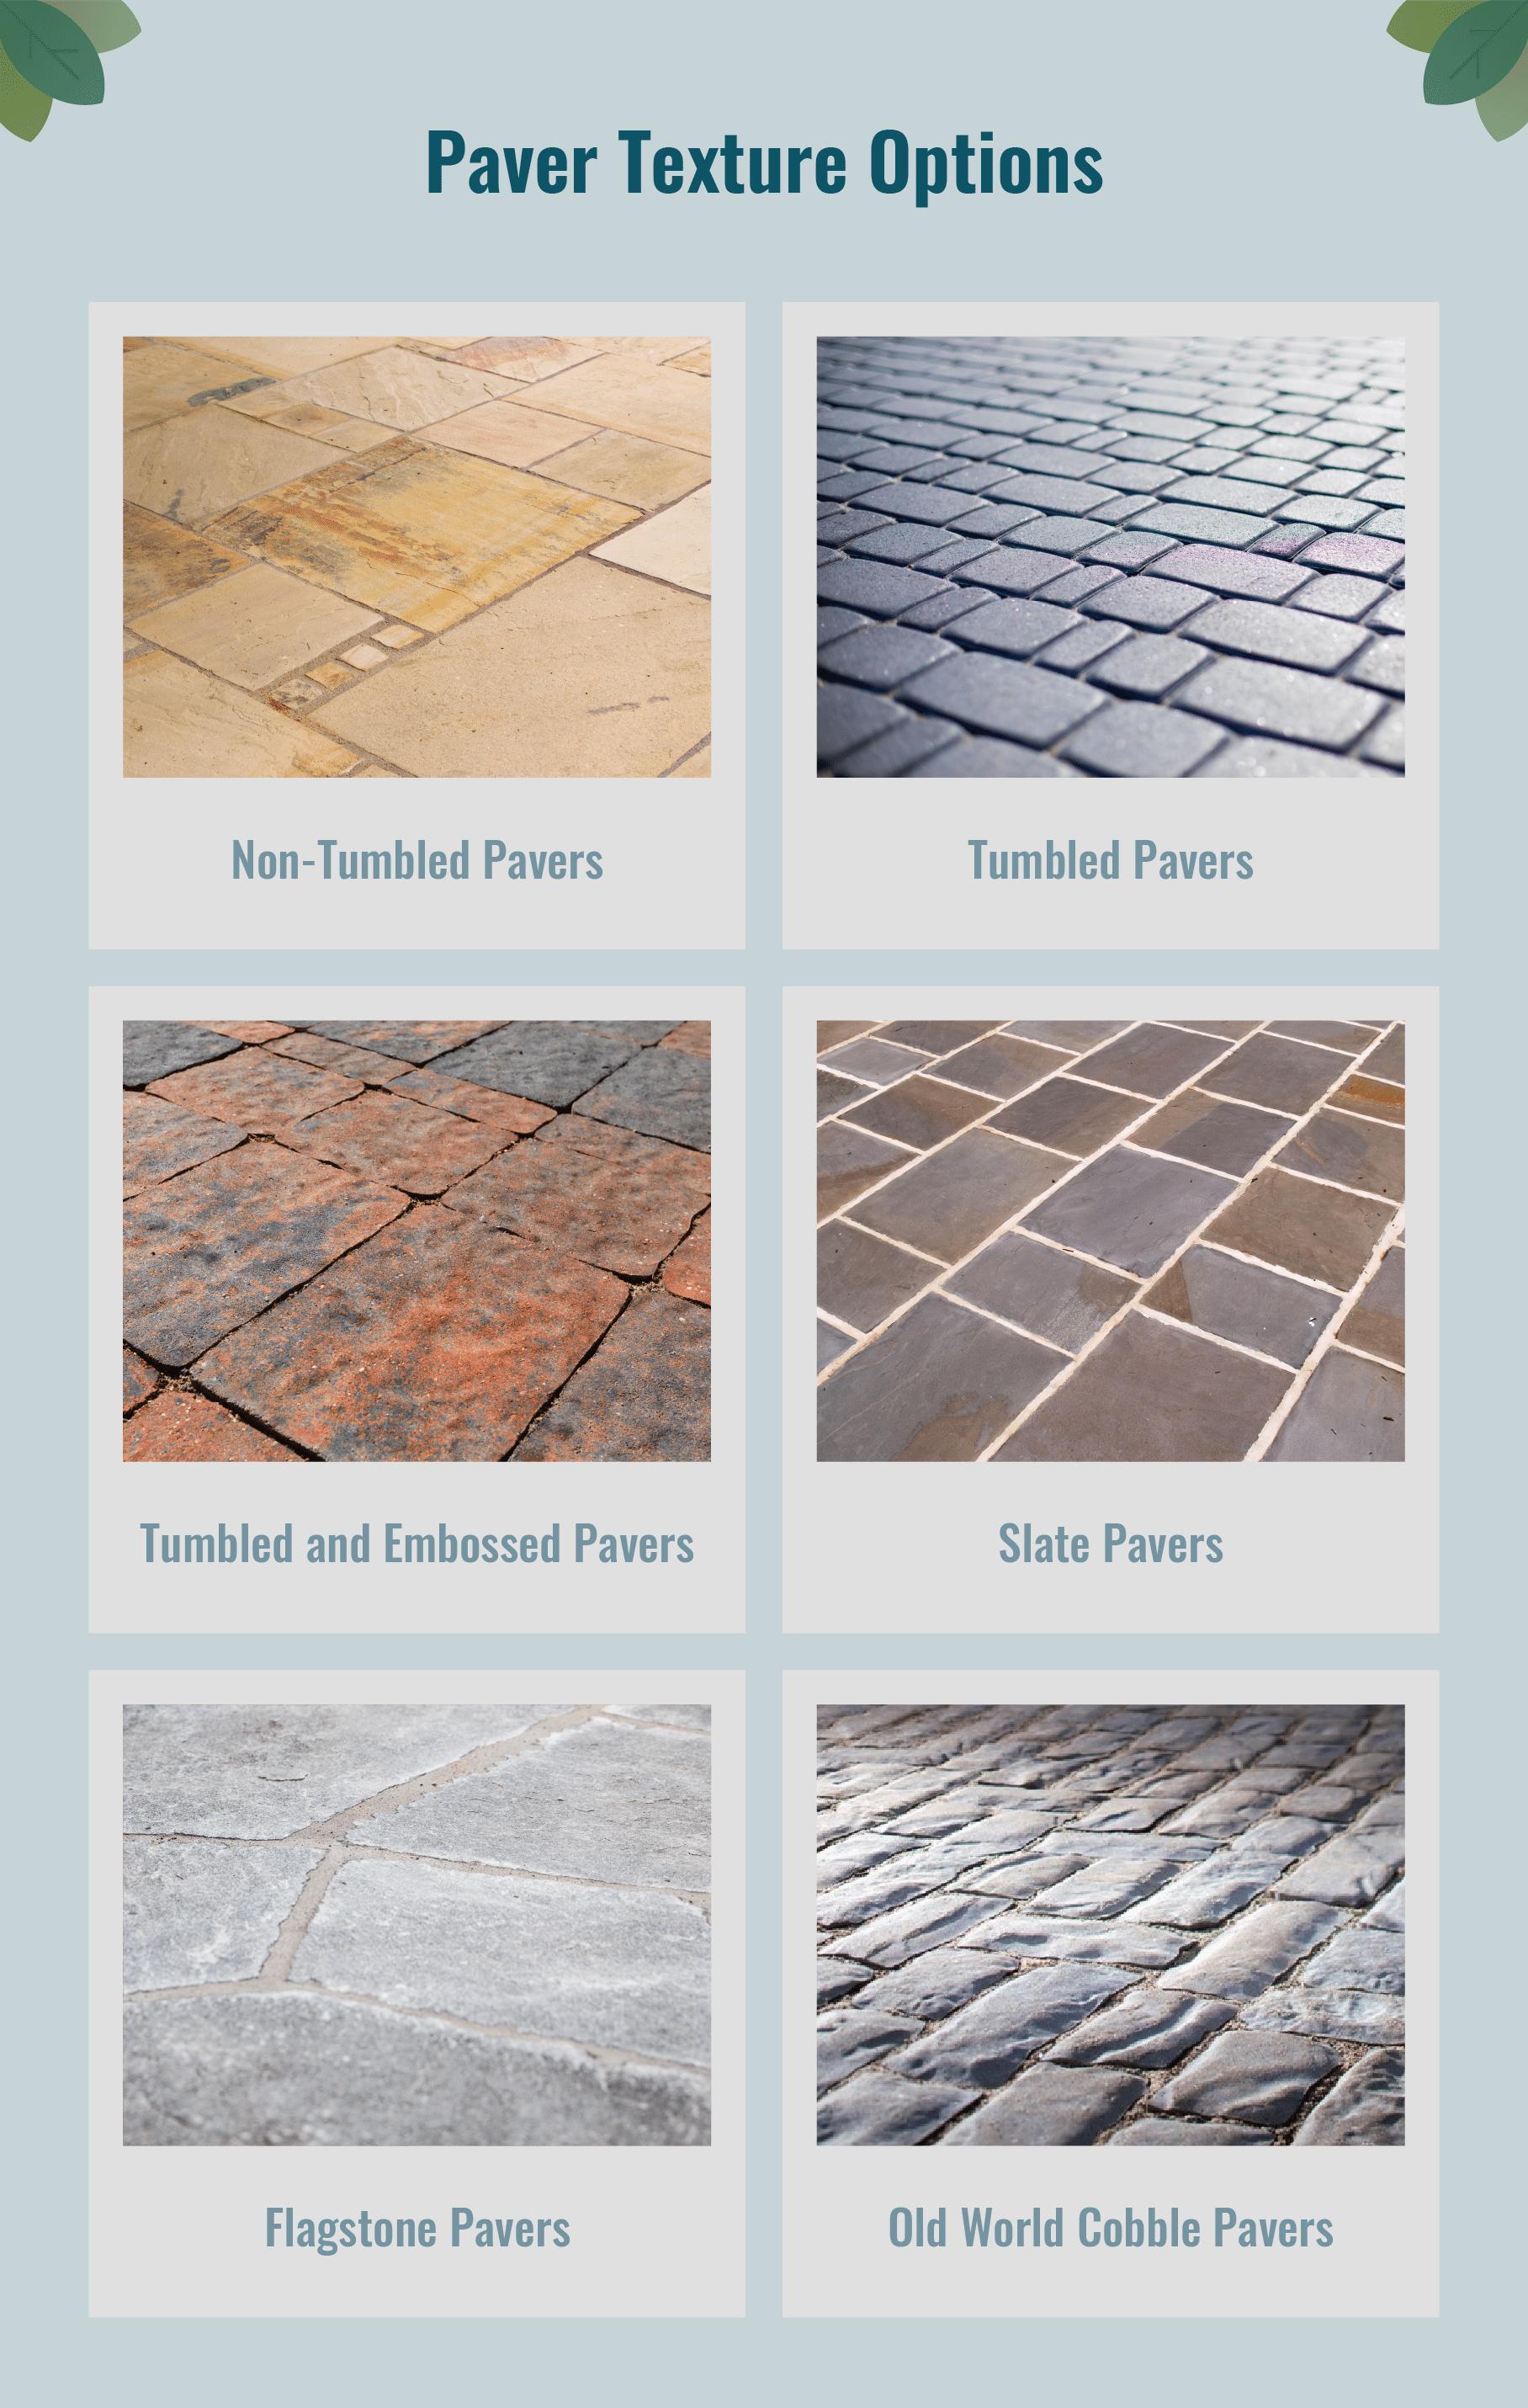 Paver Texture Options